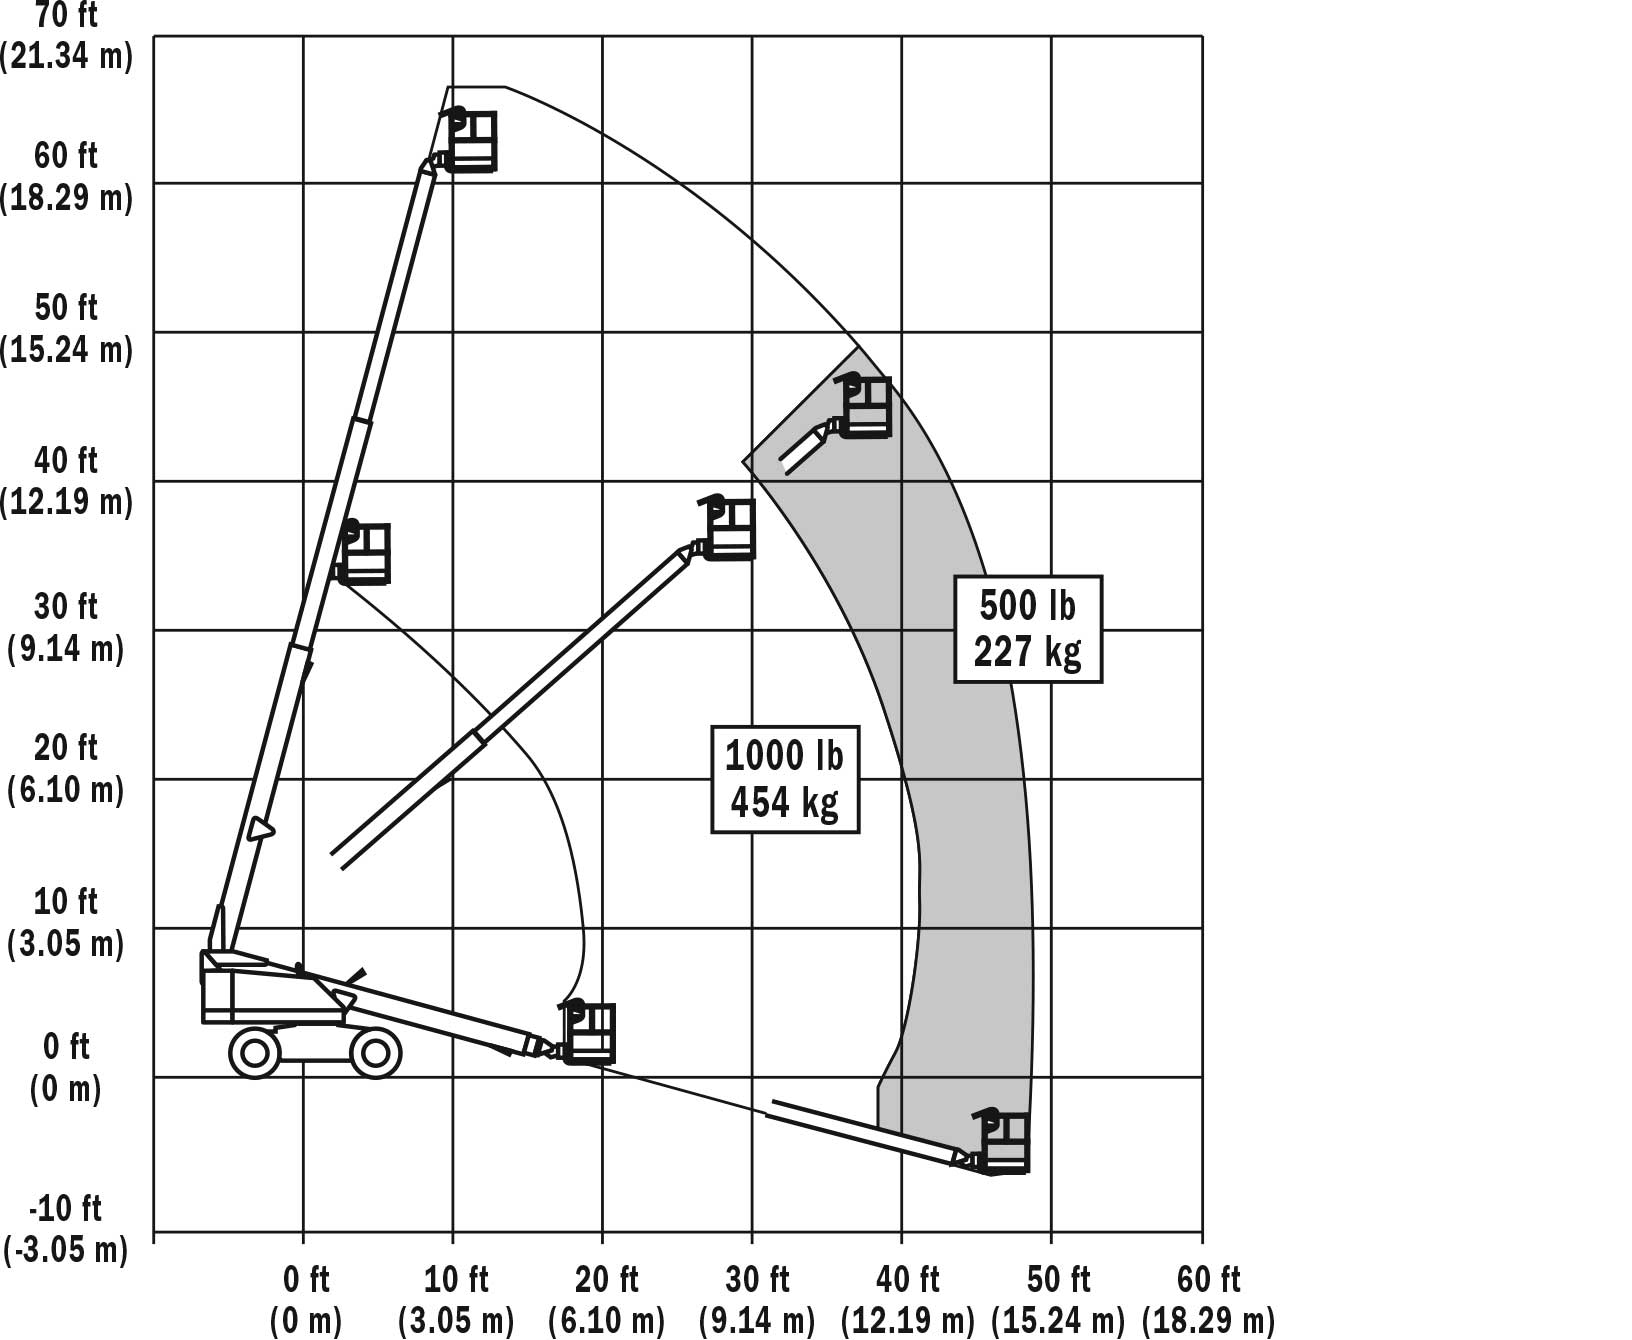 Glamorous Mec 2034ht Lift Wiring Diagram Ideas - Best Image Diagram ...